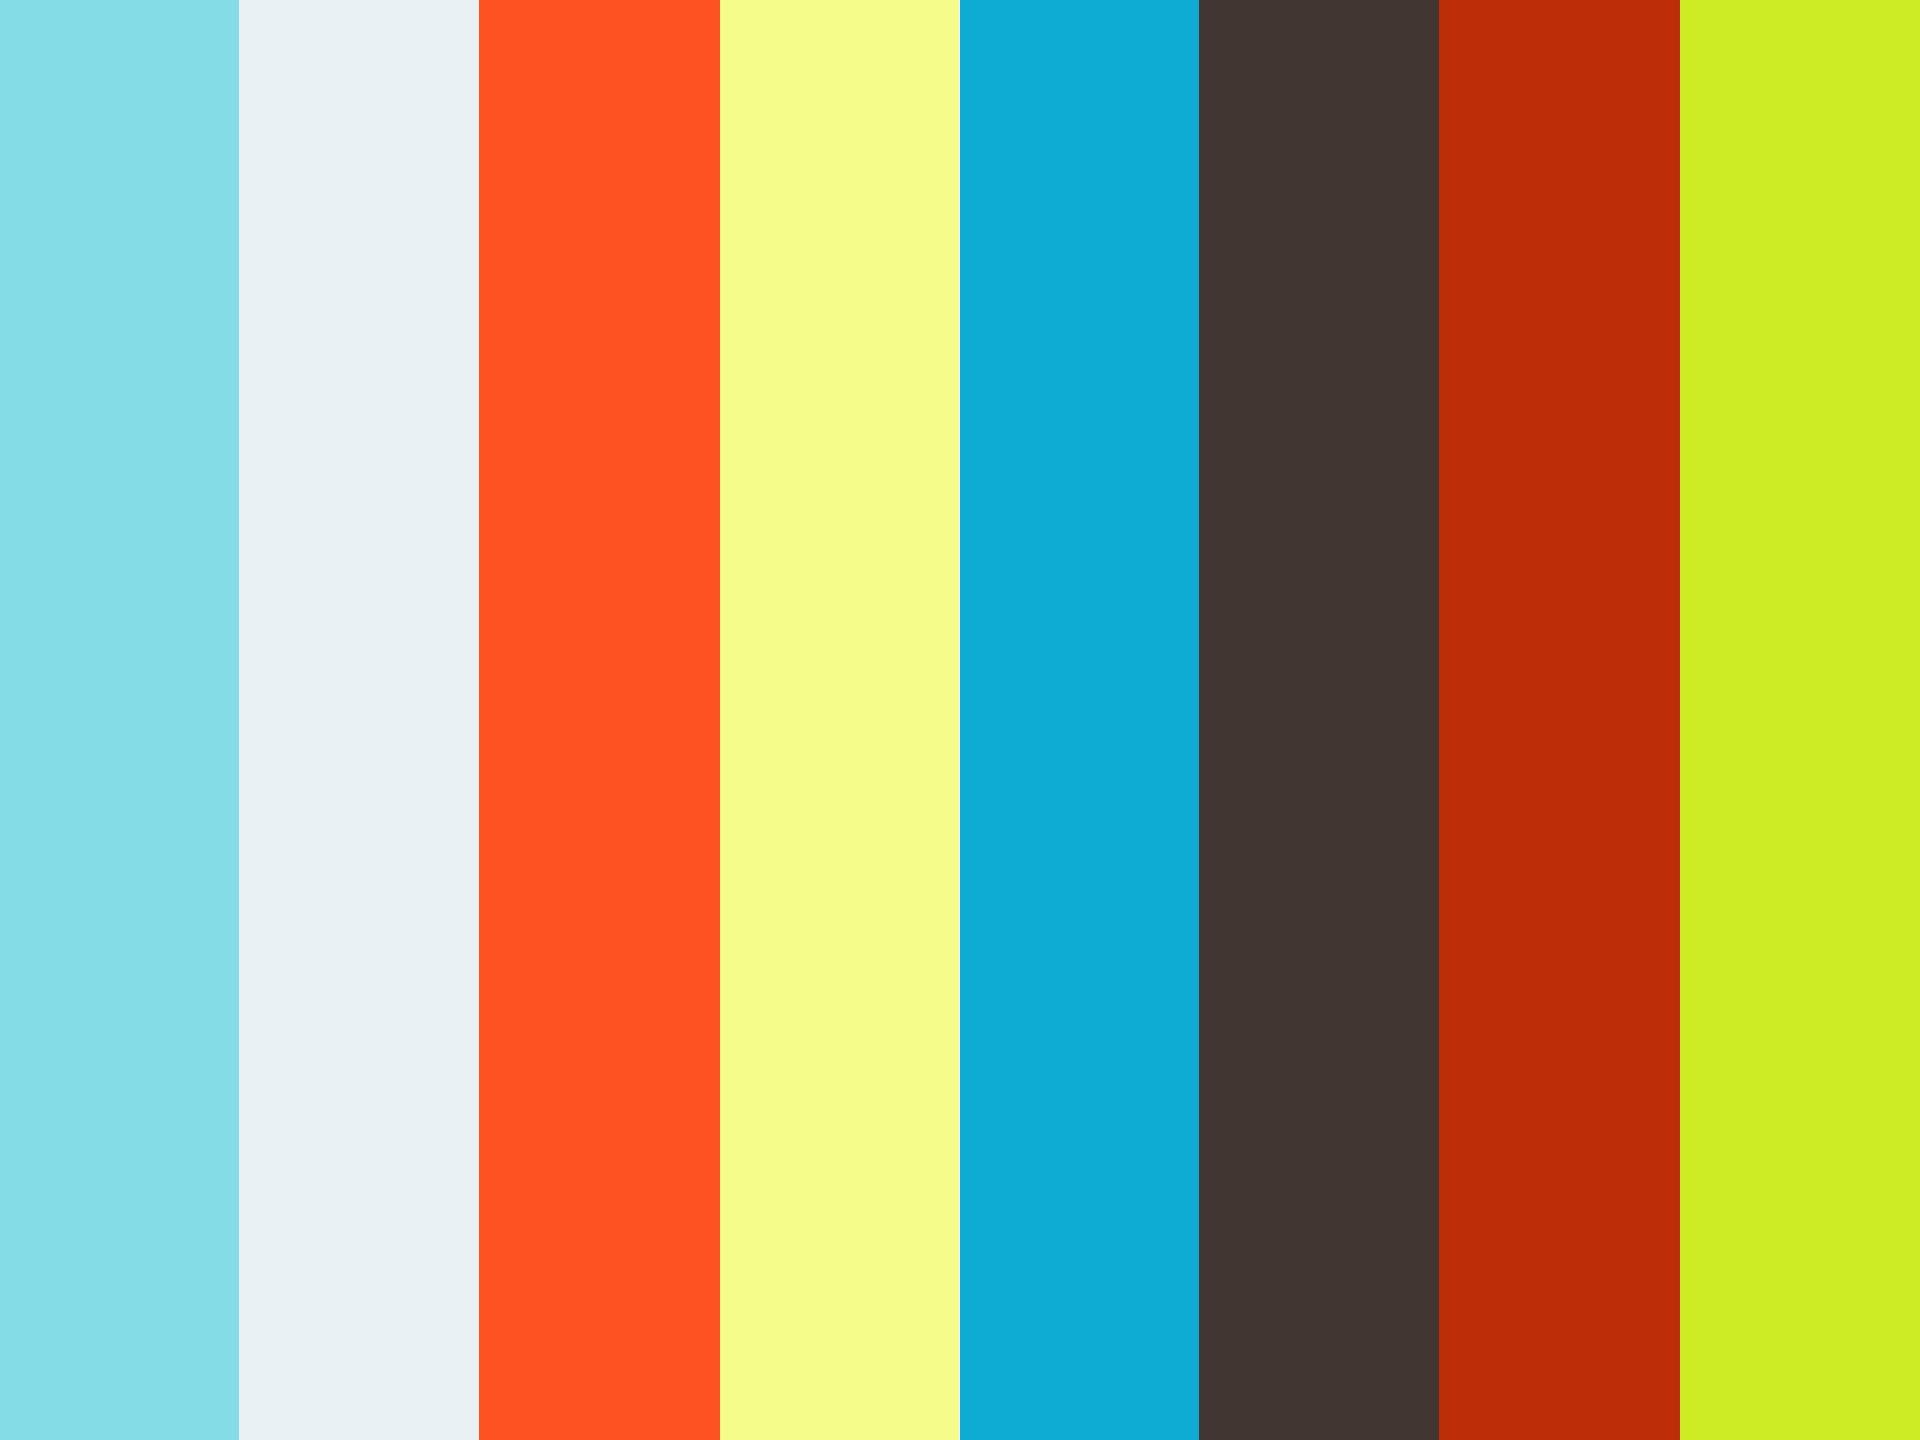 The Design Studio Method - Todd Zaki Warfel